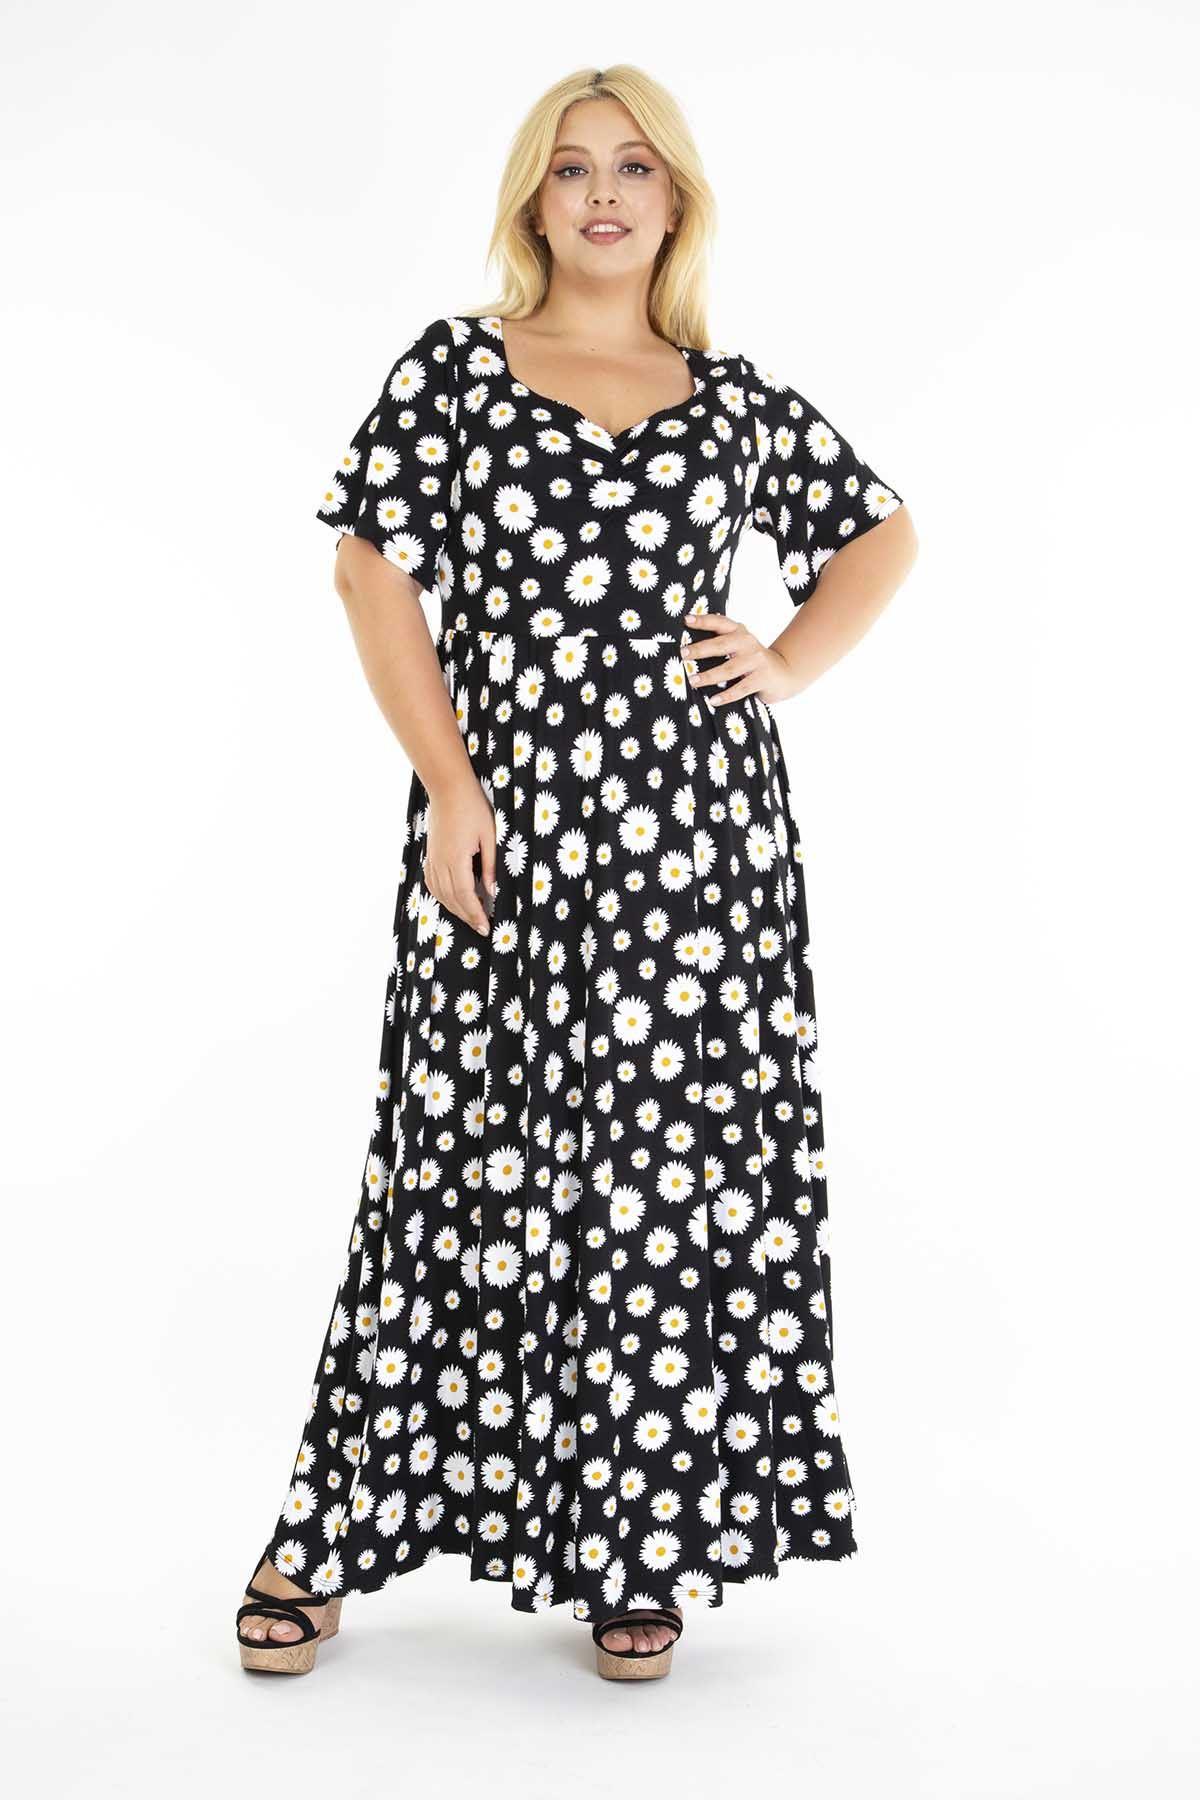 Papatya Desenli Siyah Elbise 31D-1209